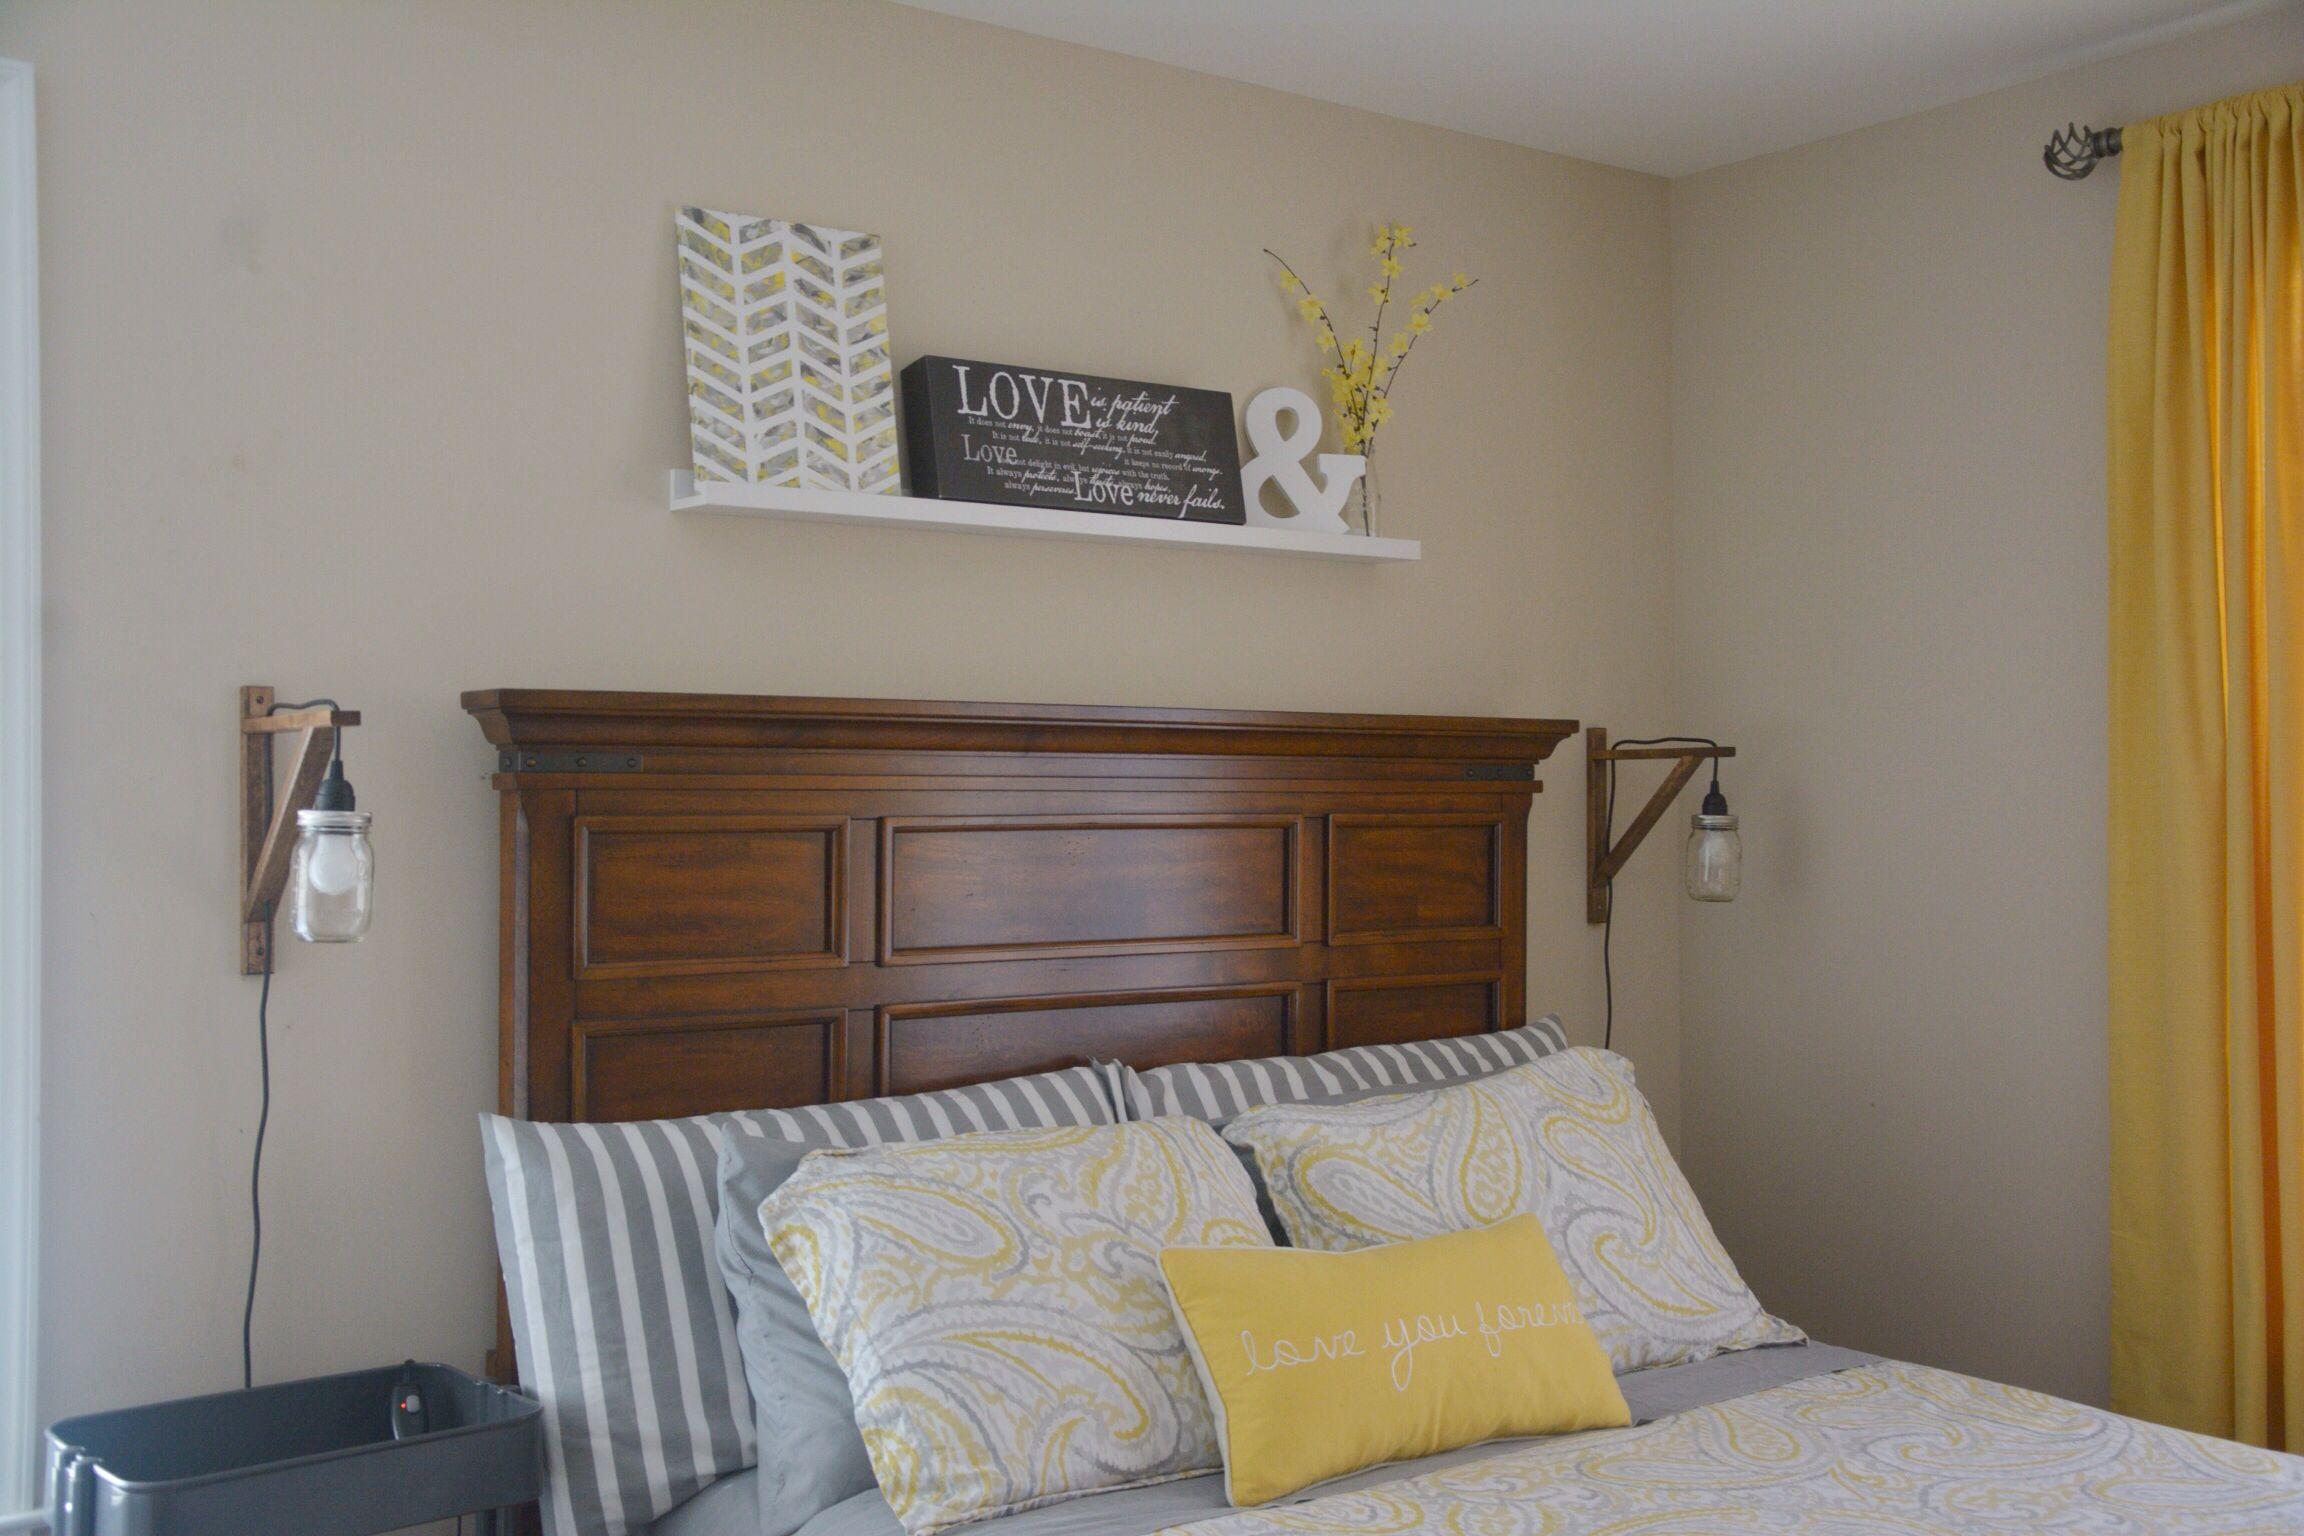 Diy Mason Jar Pendant Lights Shelf Above Bed Diy Painted